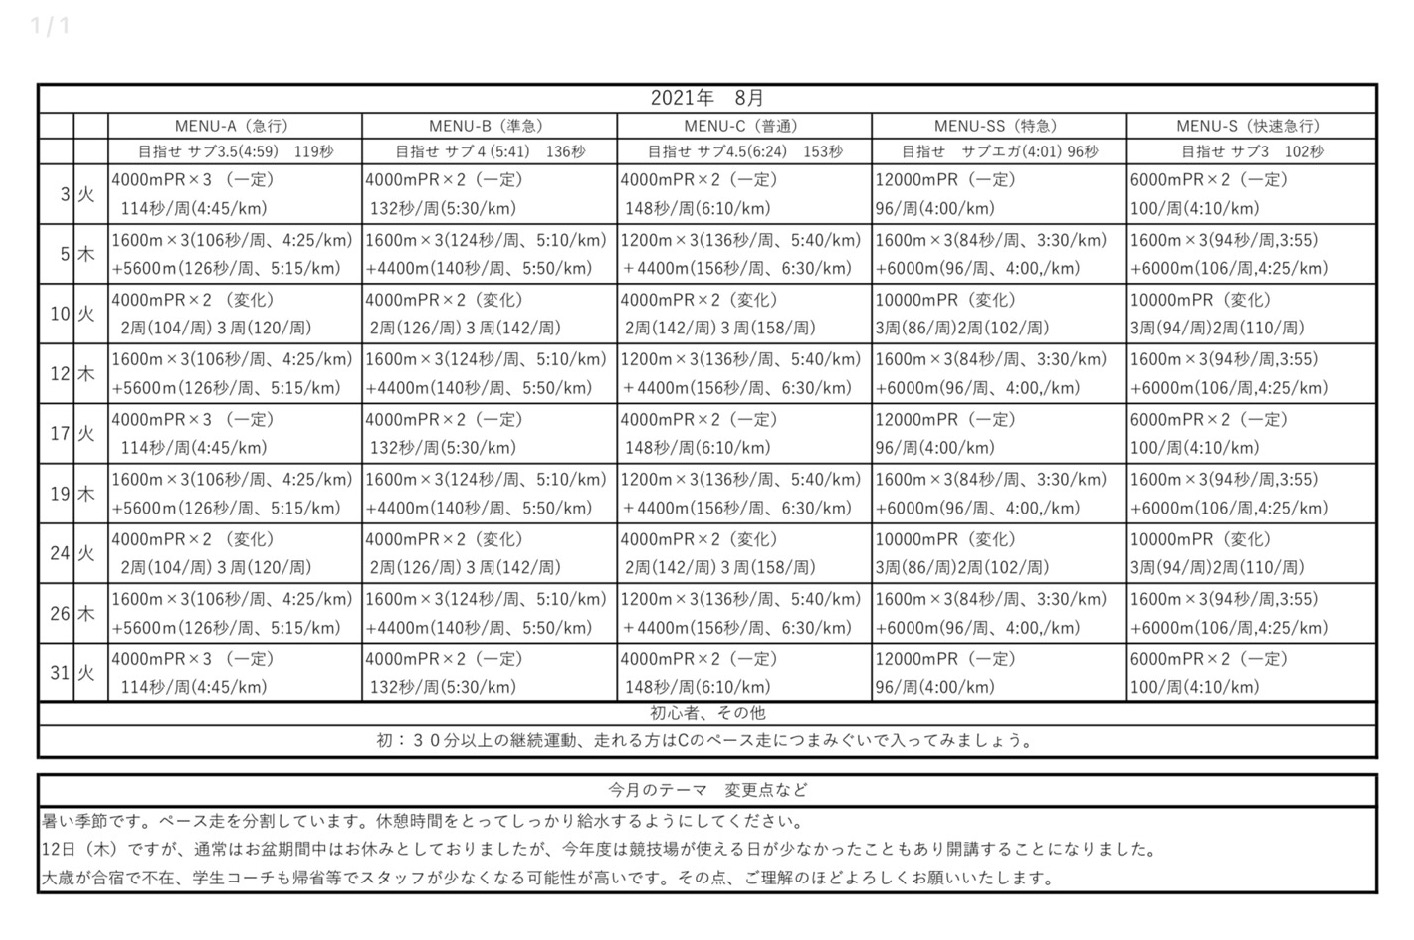 2F754ECB-8C61-4242-A7D9-61C52A6F18E3